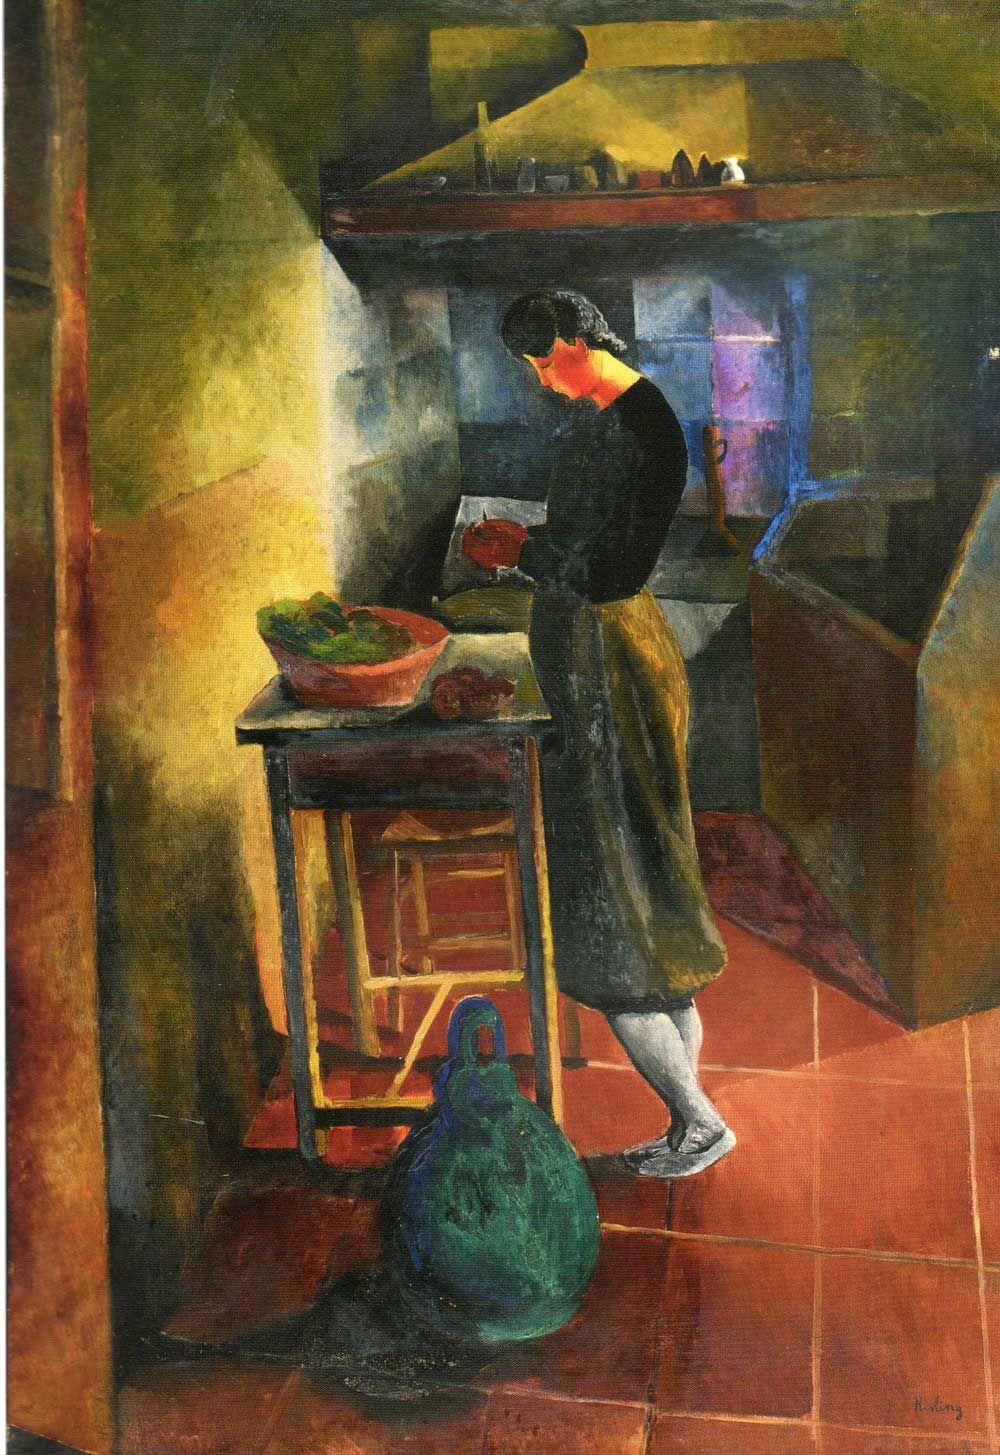 Moïse Kisling, La jeune cuisinière (1910; olio su tela, 130 x 89 cm; Collezione Netter)